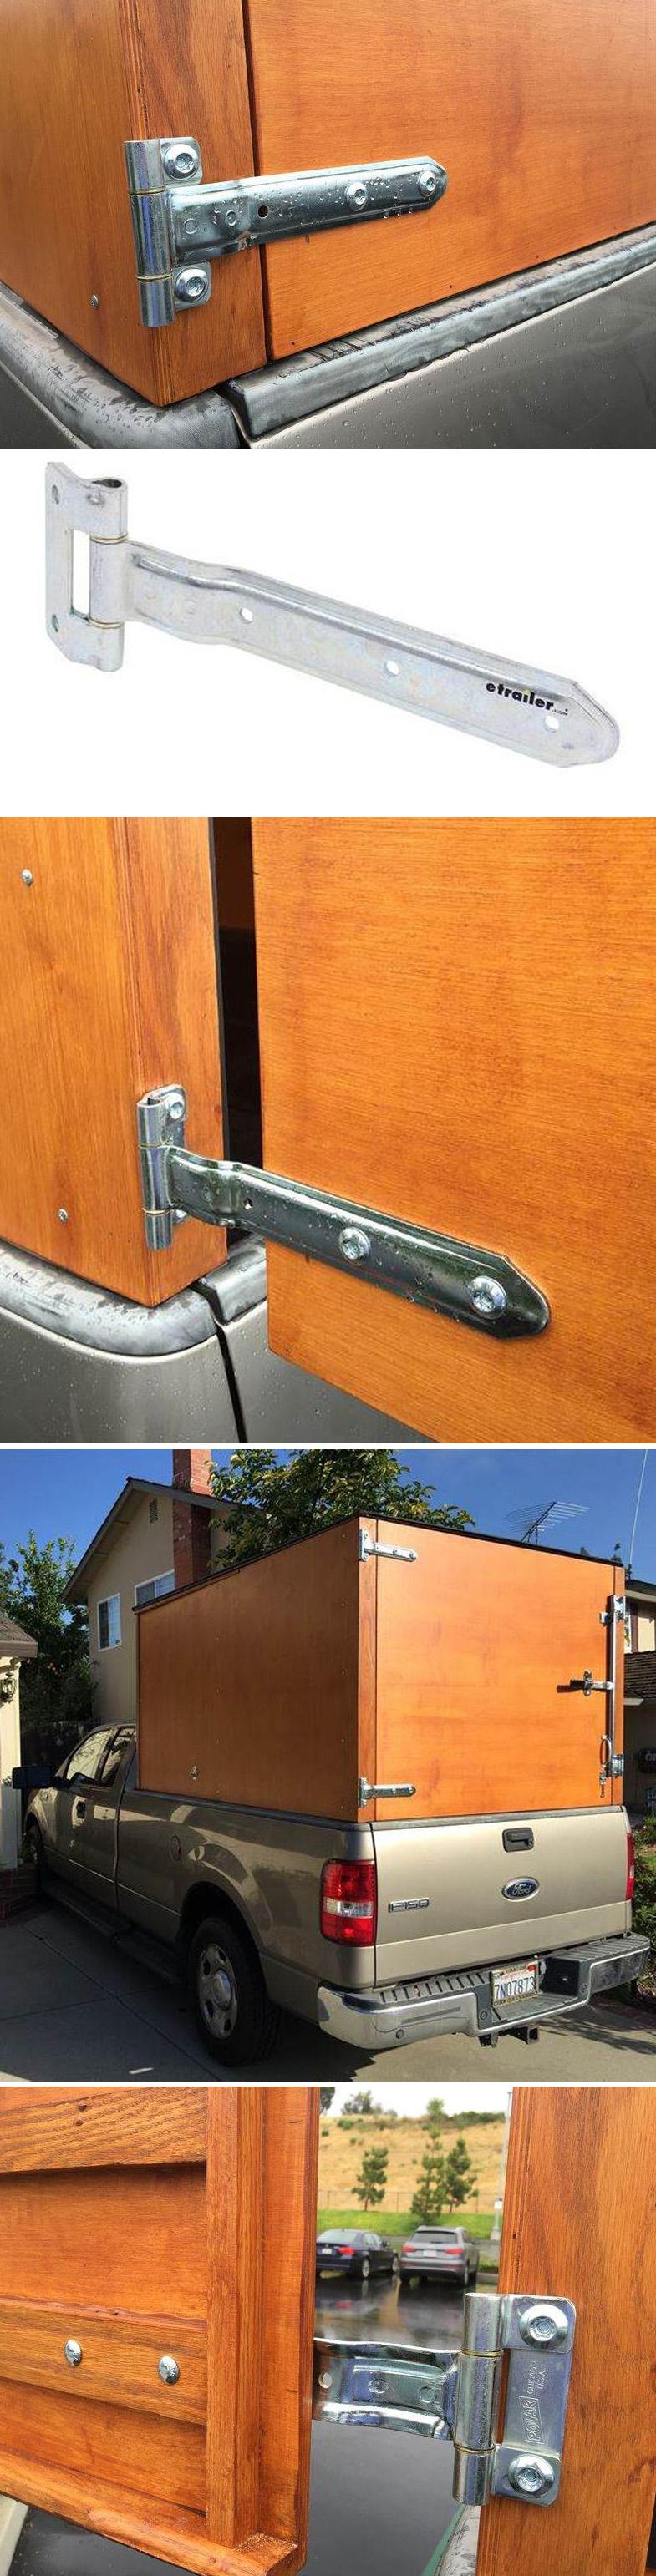 Strap Hinge For Enclosed Cargo Trailer Doors 270 Polar Hardware Trailer Door Hinges 2212 Truck Bed Box Cargo Trailers Truck Bed